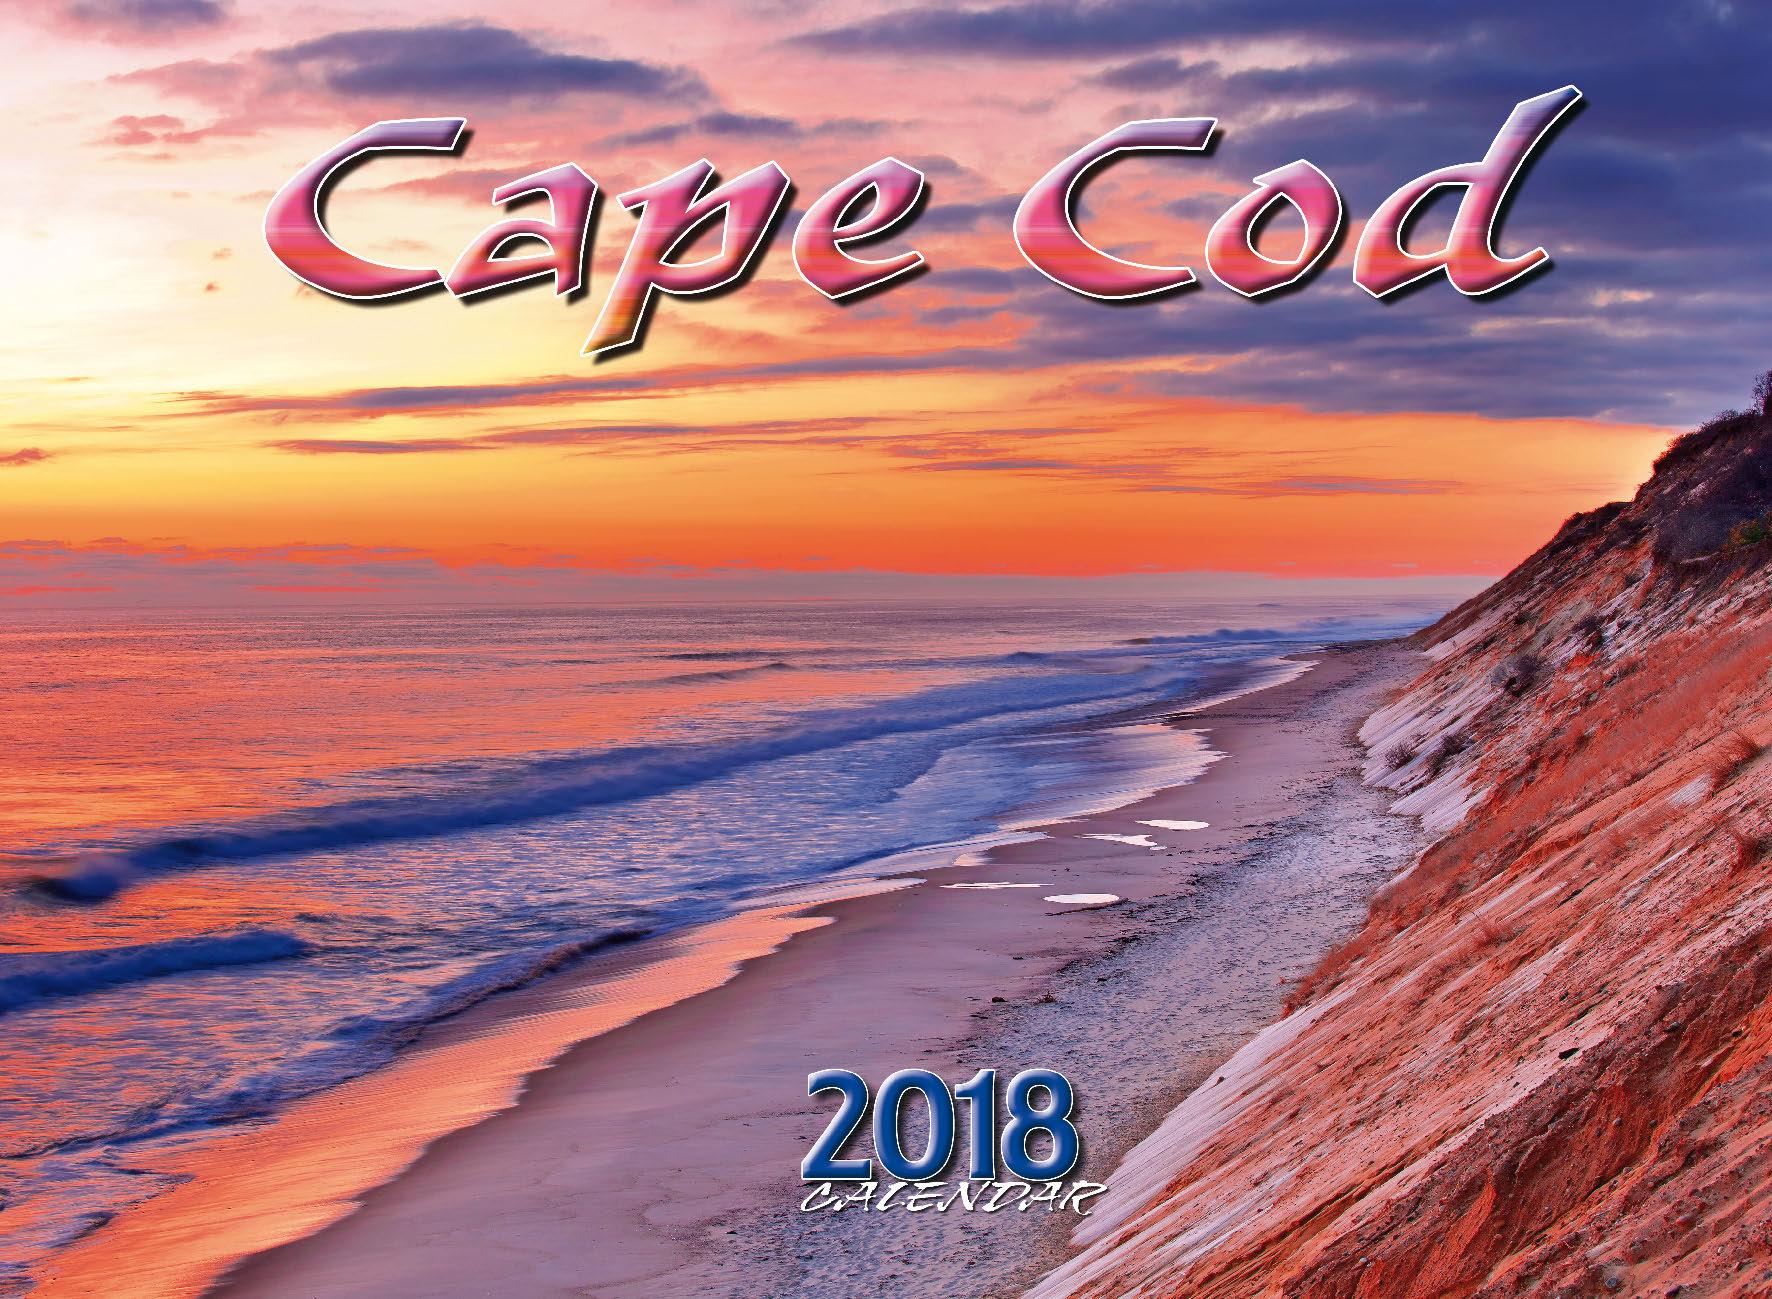 Cape Cod Festivals 2018   craigslist cape cod